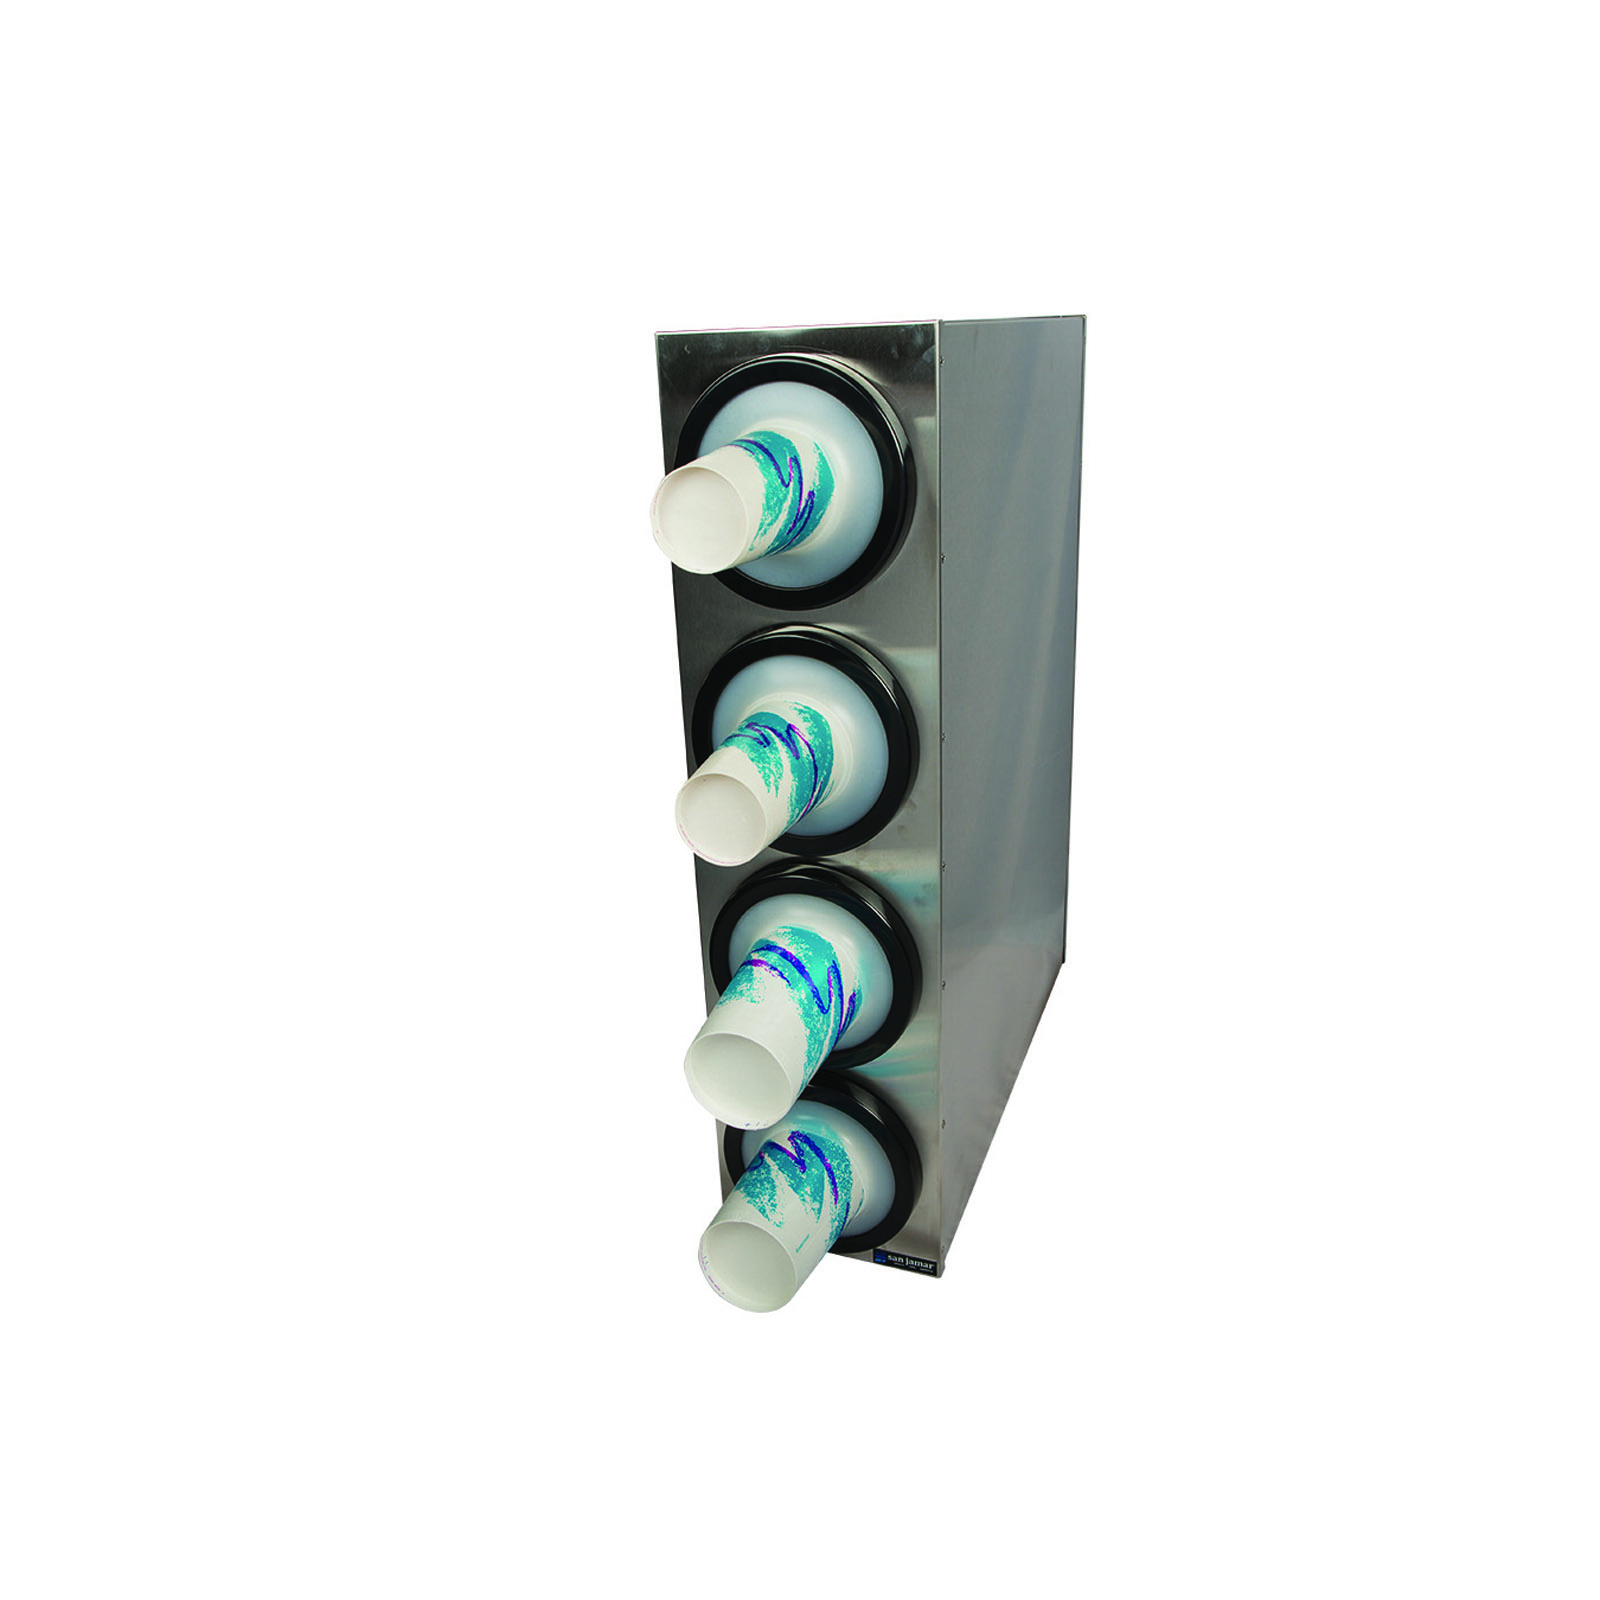 San Jamar C2804 cup dispensers, countertop